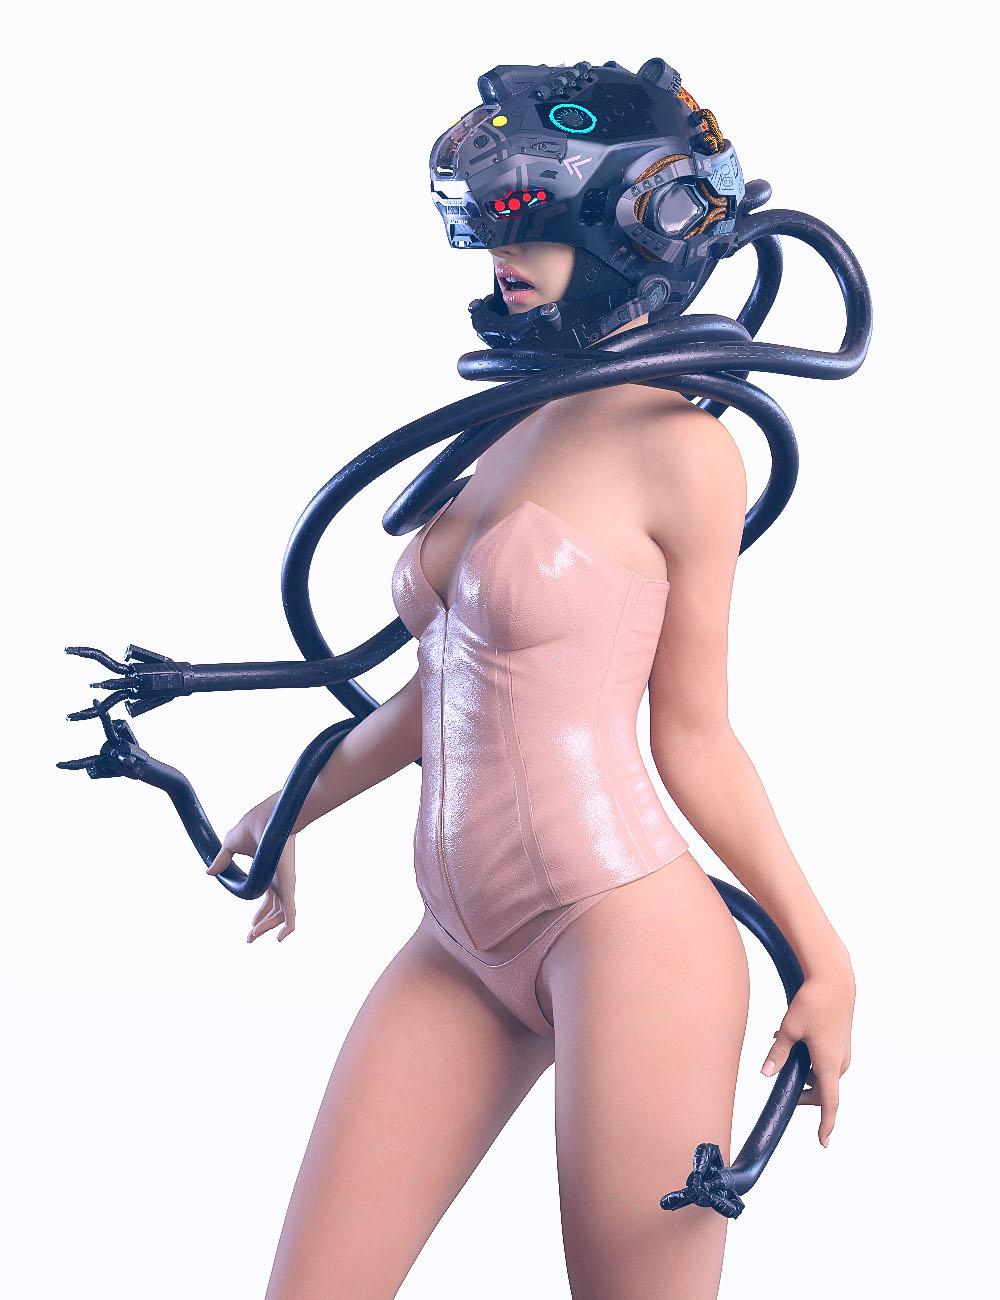 SciFi Medusa by: chungdan, 3D Models by Daz 3D